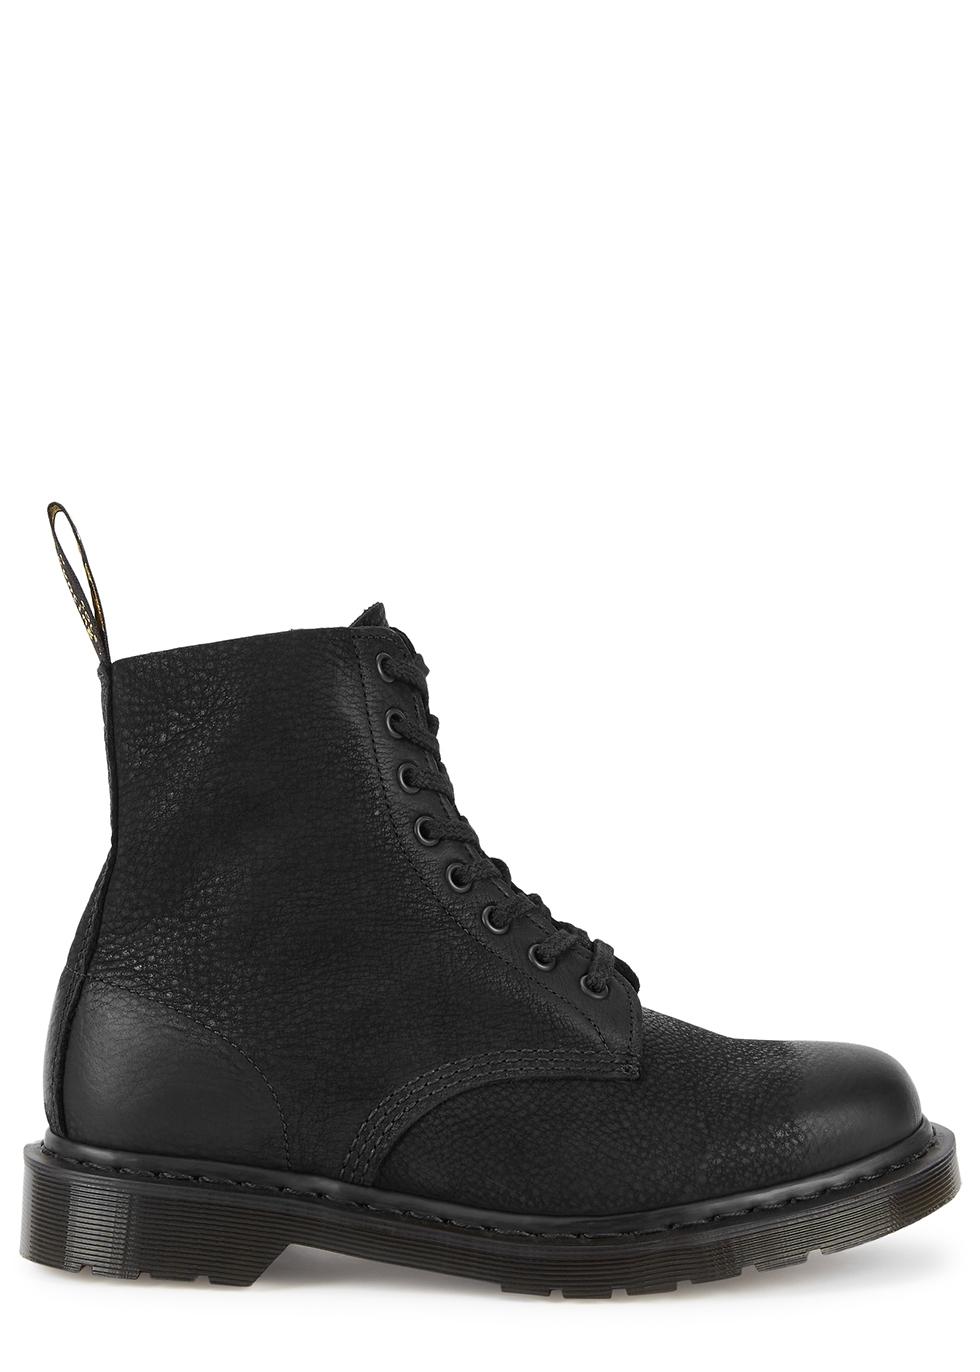 1460 Pascal black nubuck ankle boots